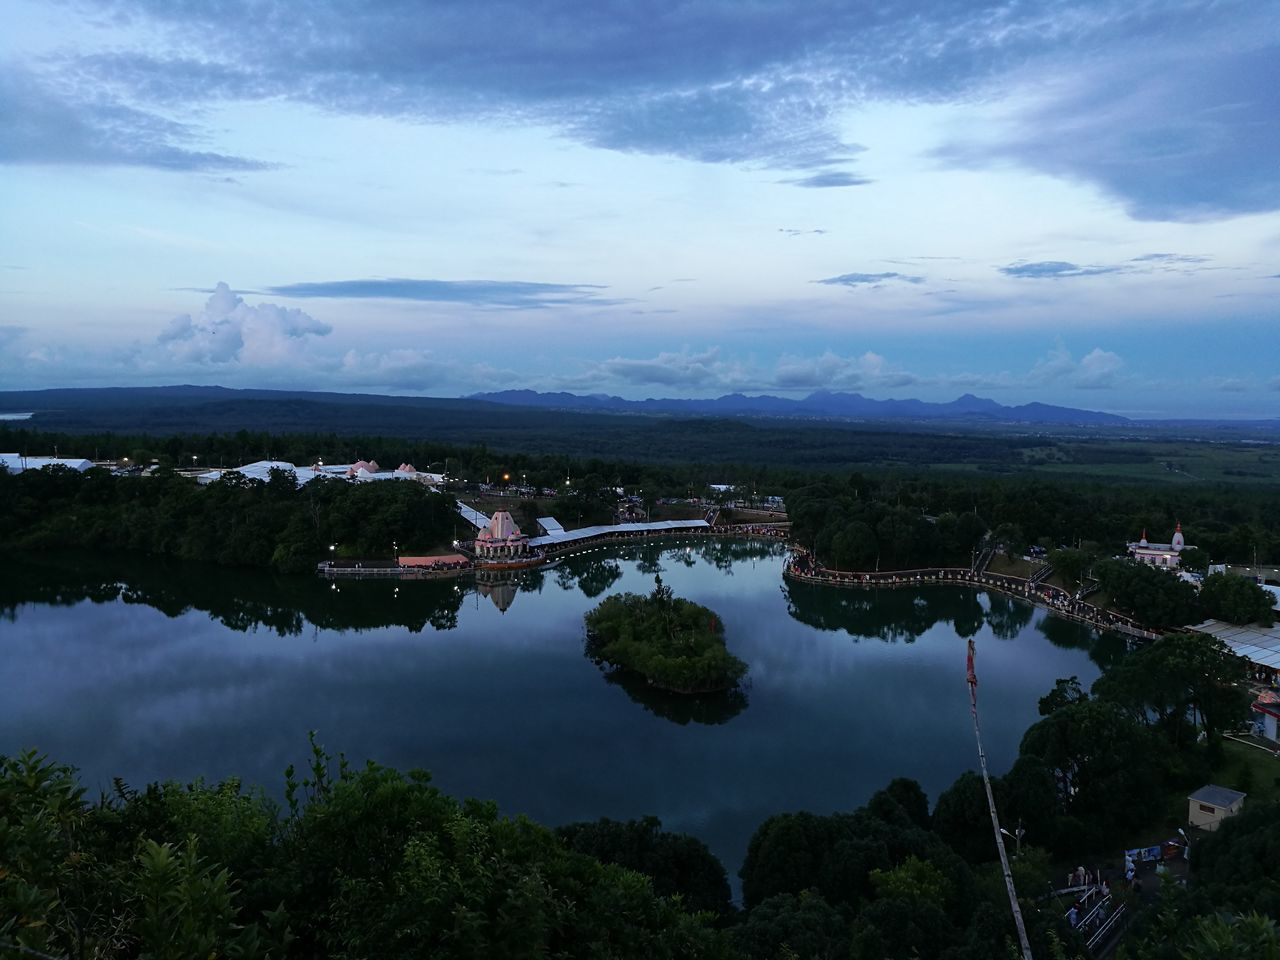 Ganga_Talao Reflection Blue Sky Prayer Shiva Temple Landscape Water Beauty Tranquility Cloud - Sky Nature Outdoors Night